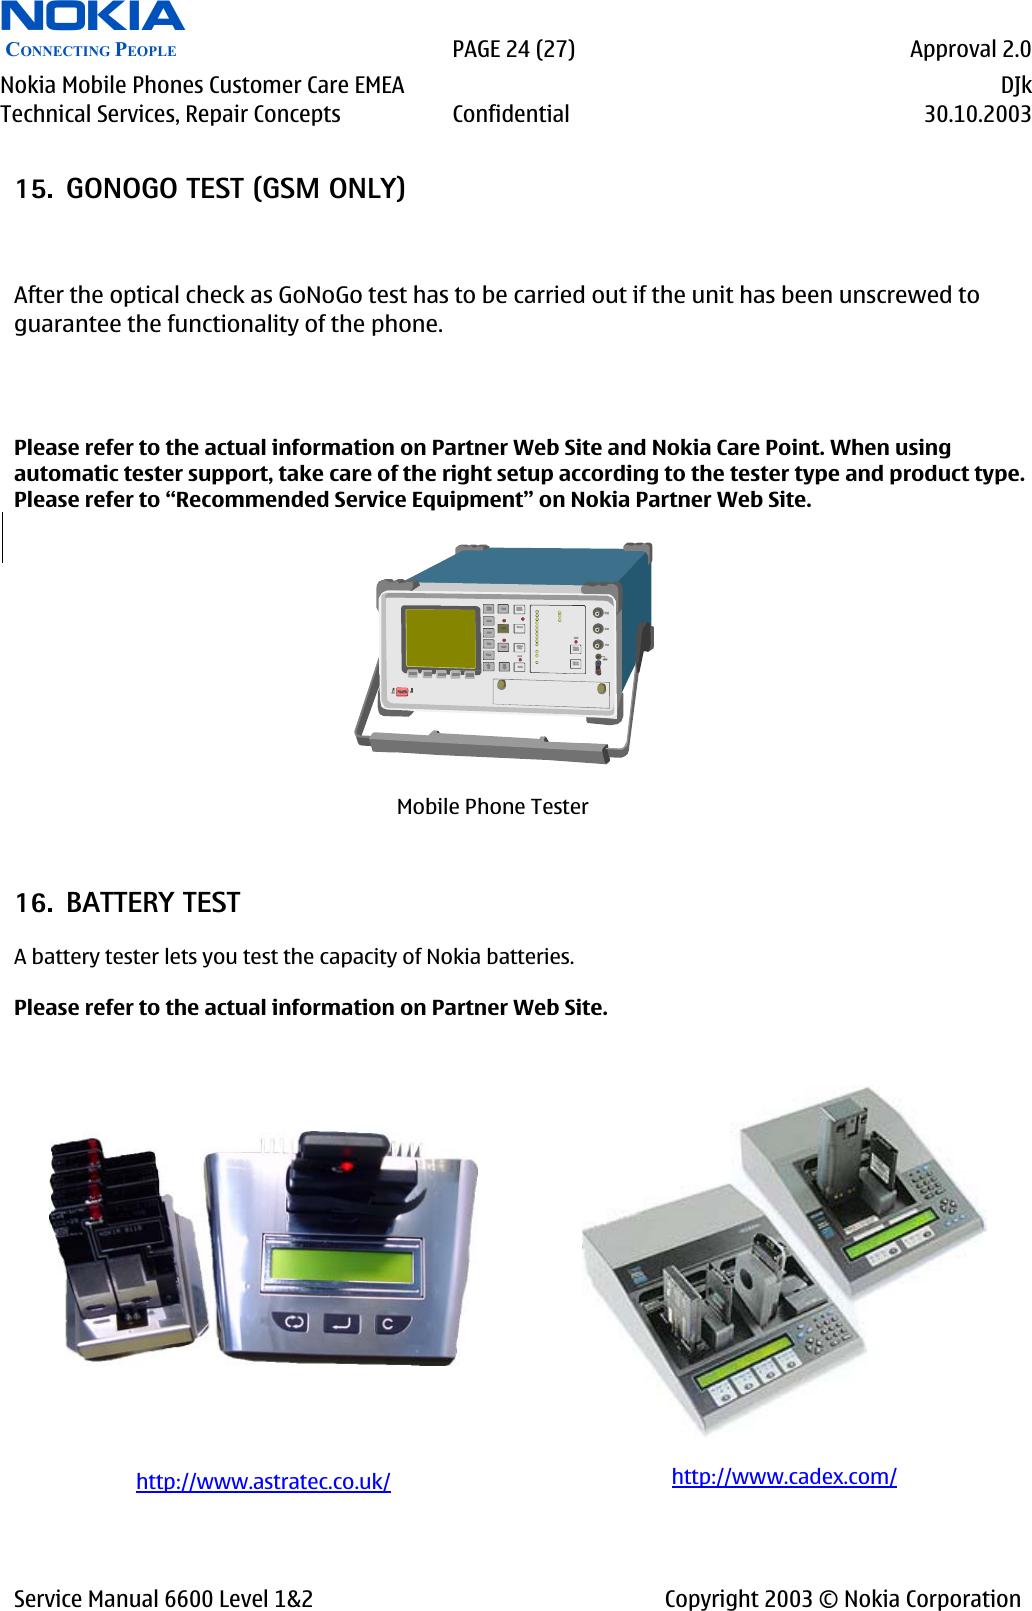 Service Manual 6600 Level 1&2 Nokia Nhl 10 1,2